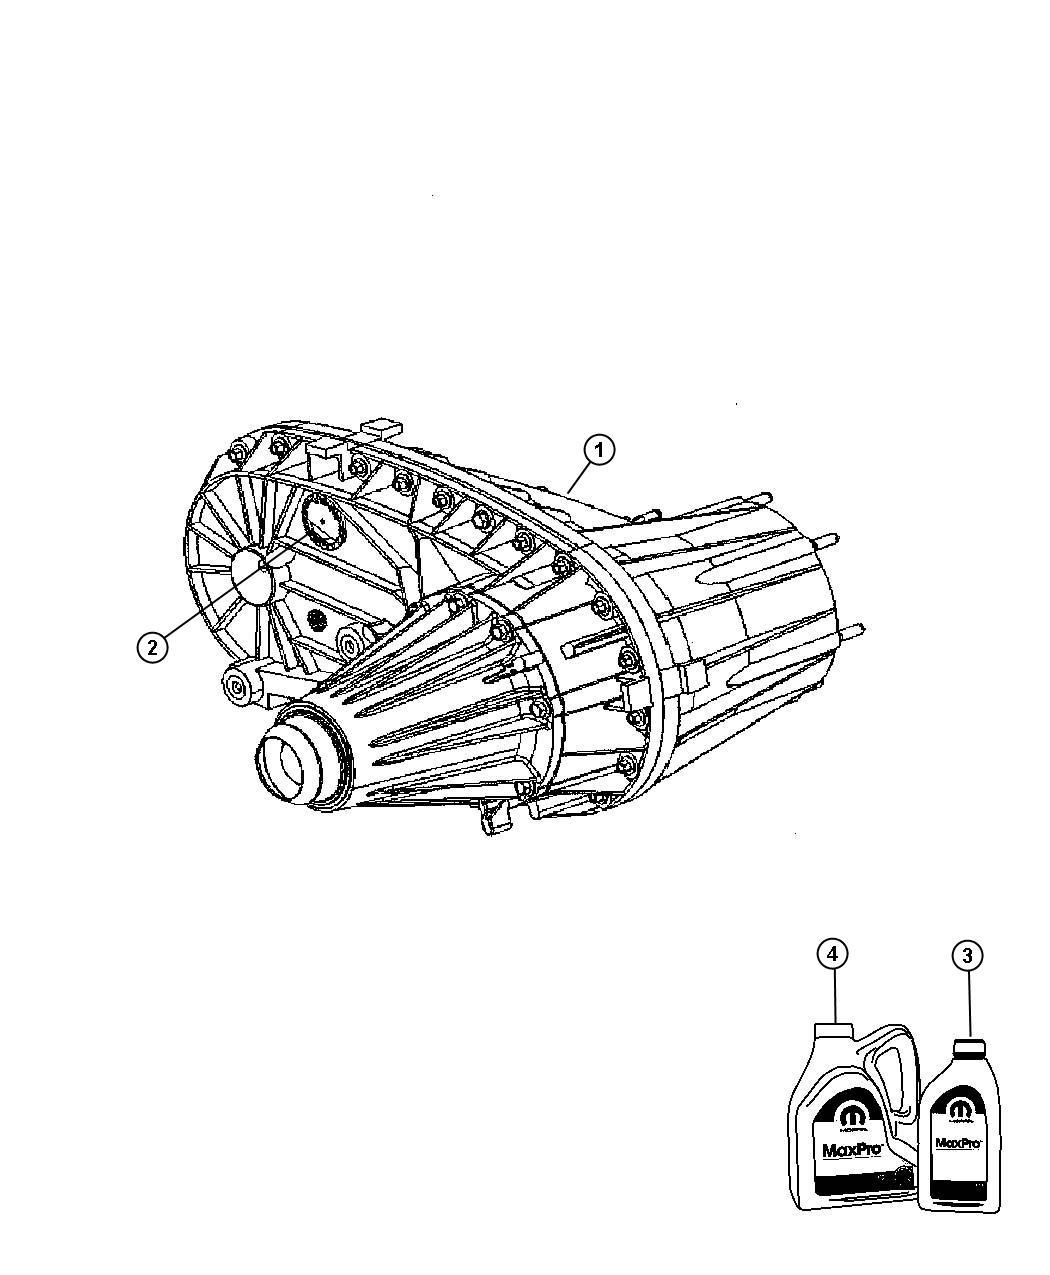 Dodge Ram 5500 Fluid. Automatic transmission atf+4. 5